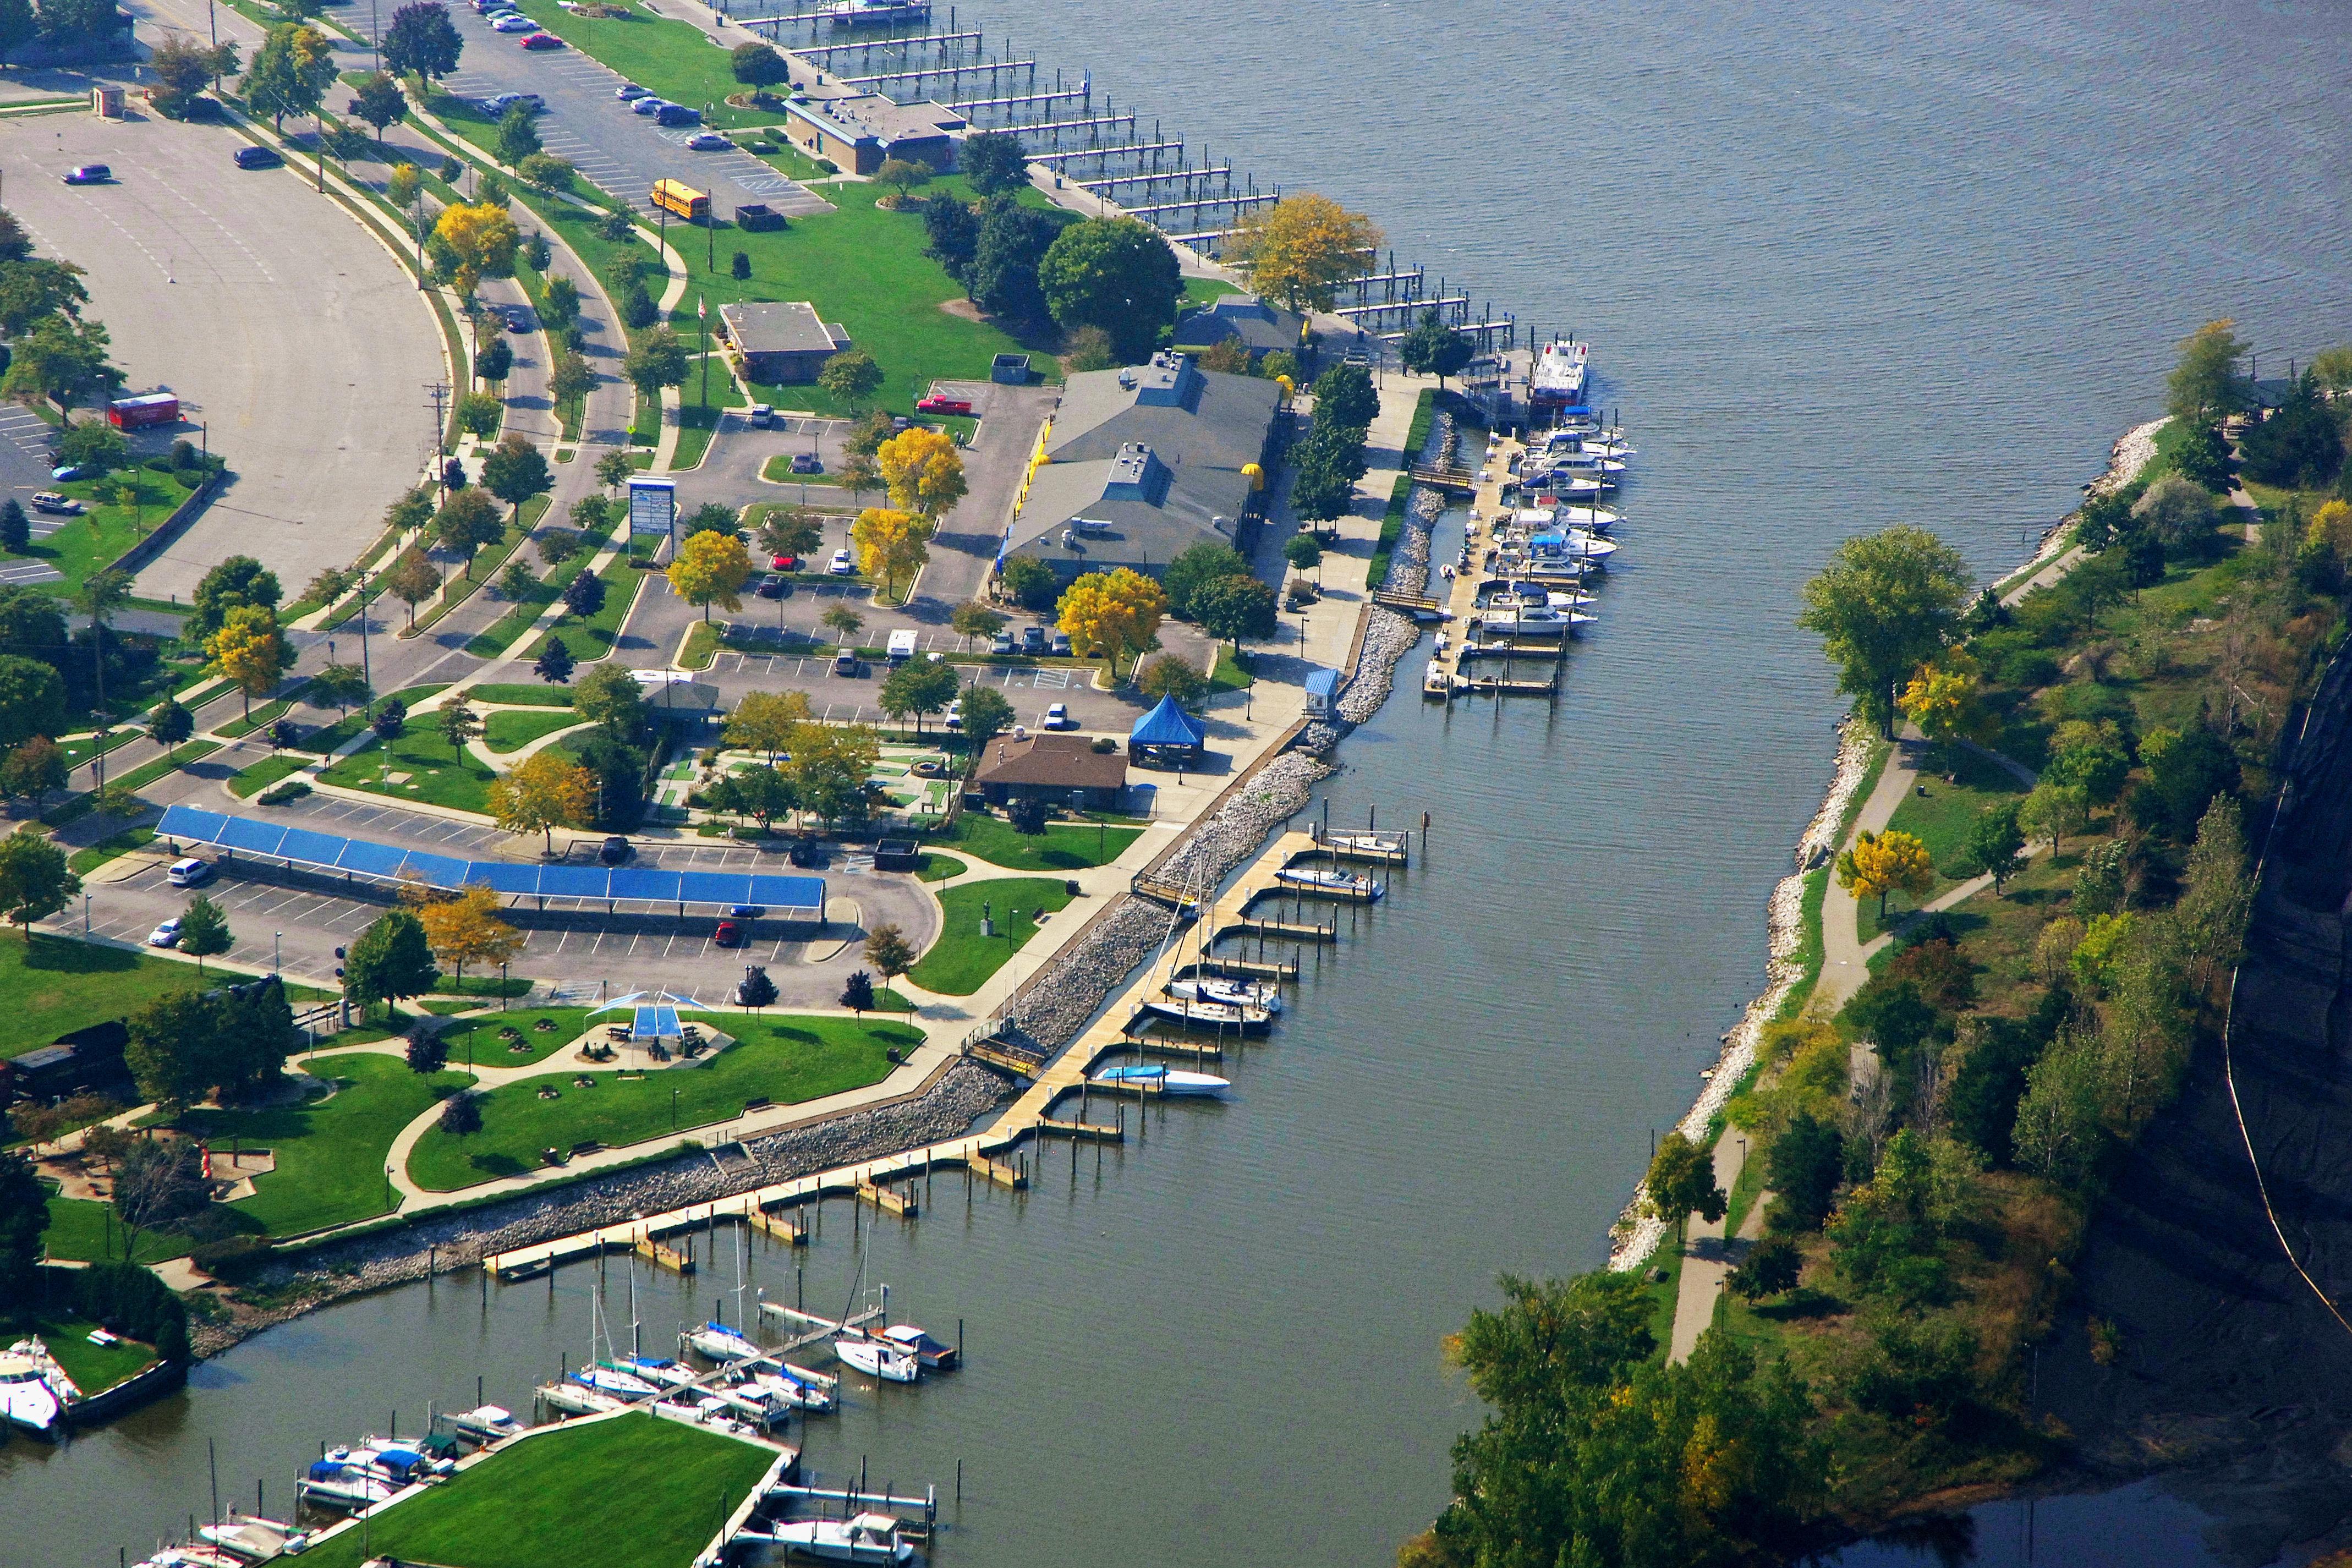 2 vtg. GRAND HAVEN, MICHIGAN postcards, Boat traffic in